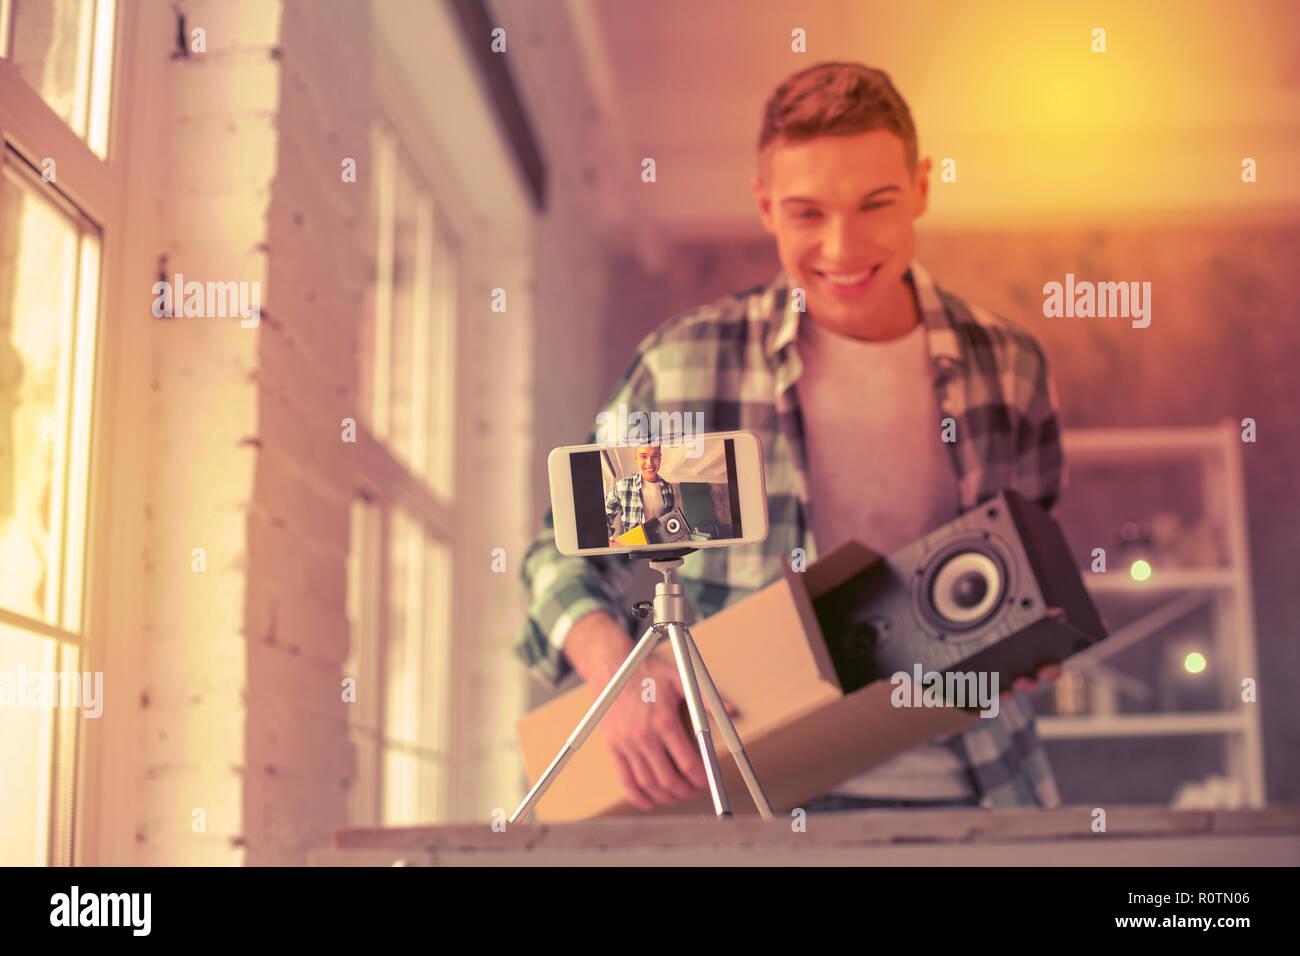 Joyful young blogger showing item hes opening - Stock Image